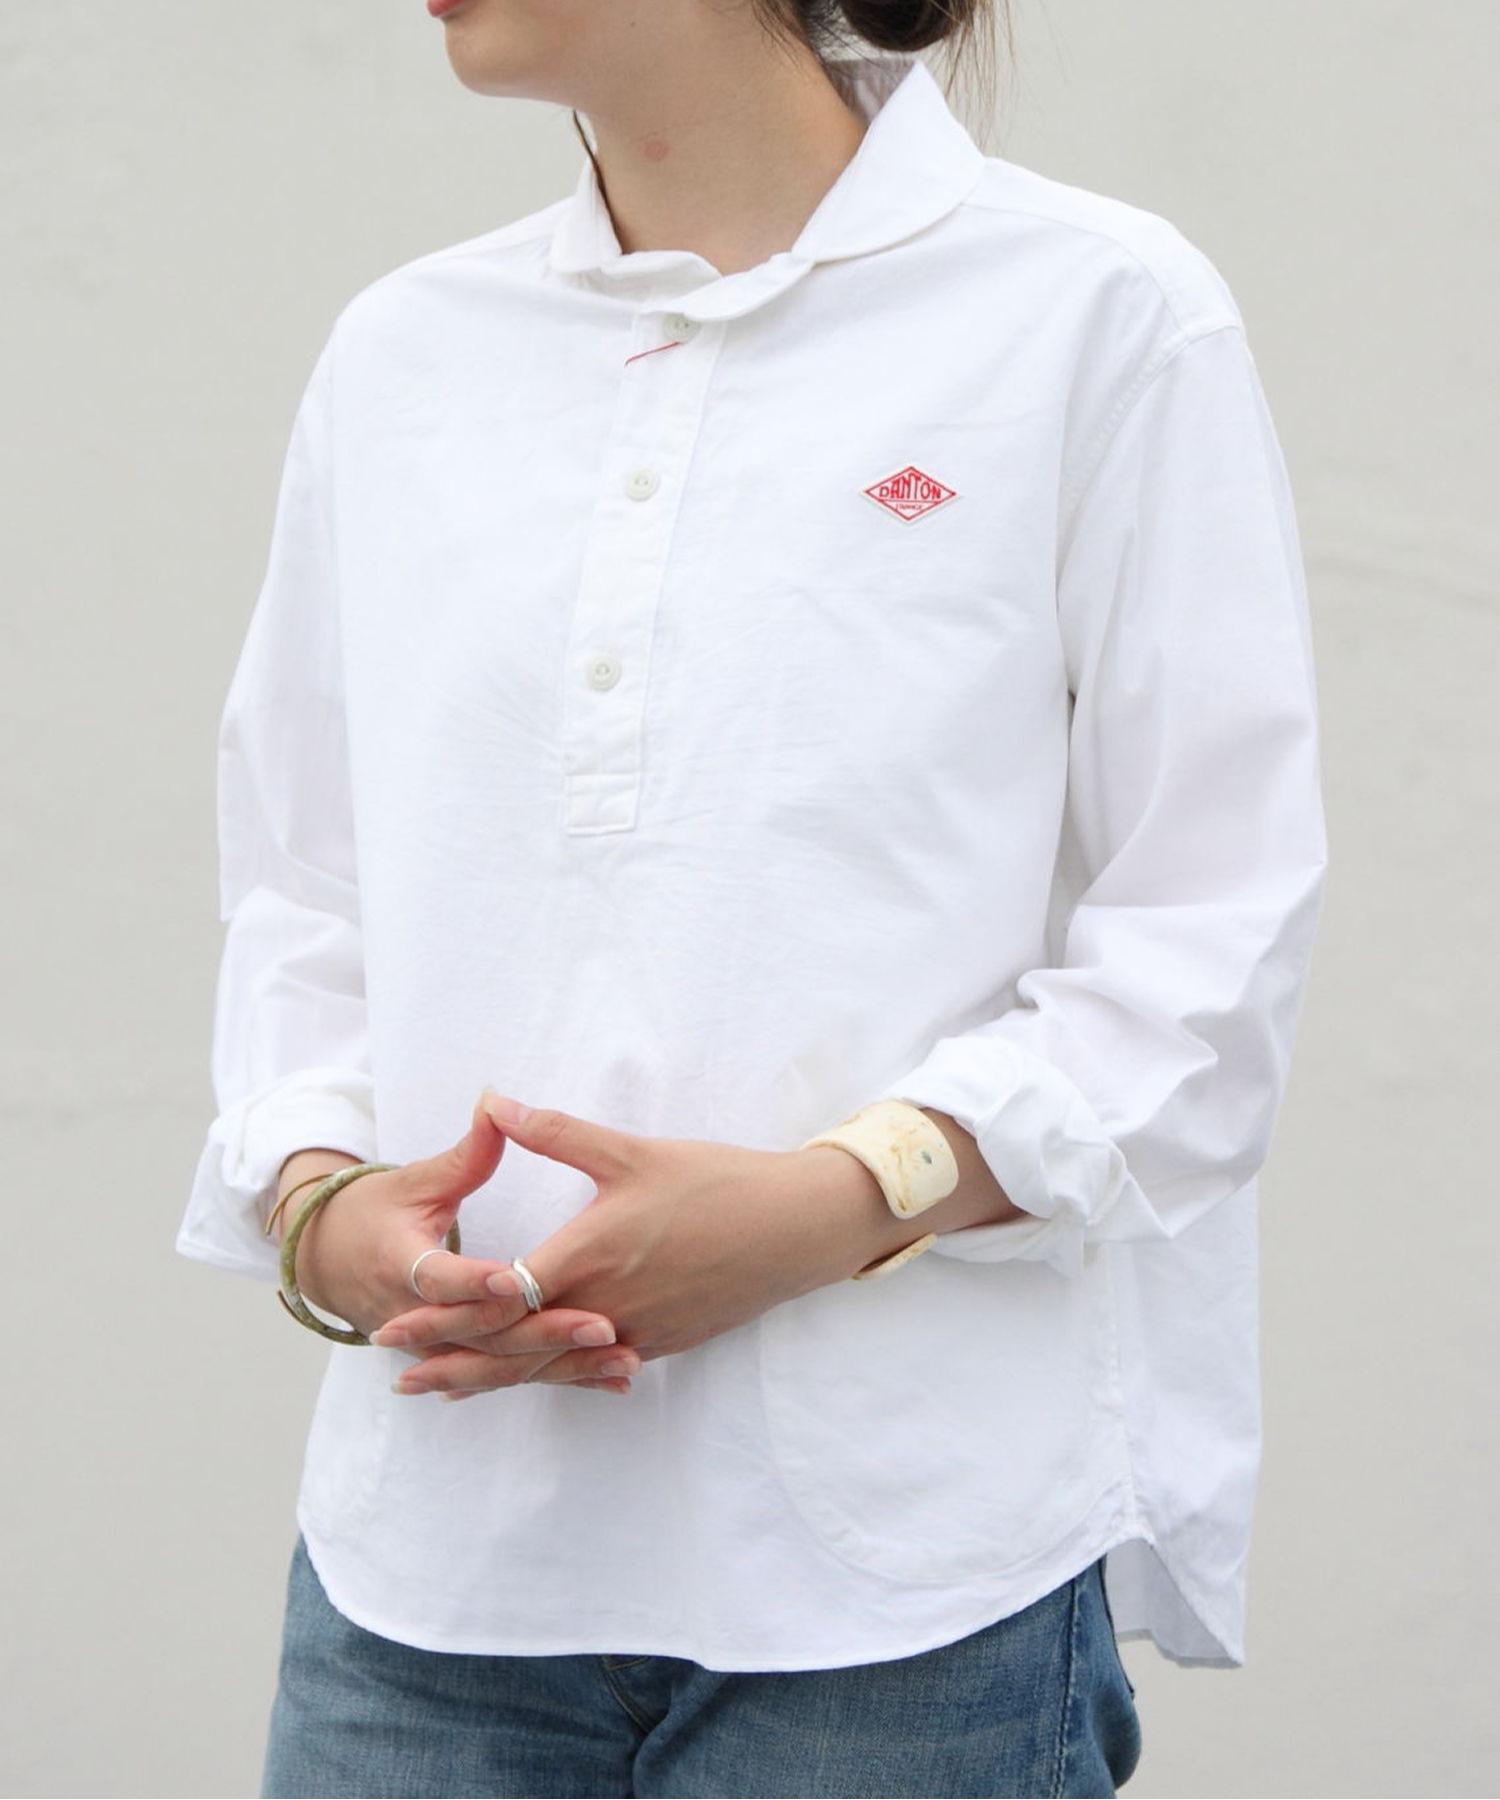 DANTON/ダントン オックスプルオーバーシャツ OX PULLOVER SHIRT JD-3564YOX(ウィメンズ)